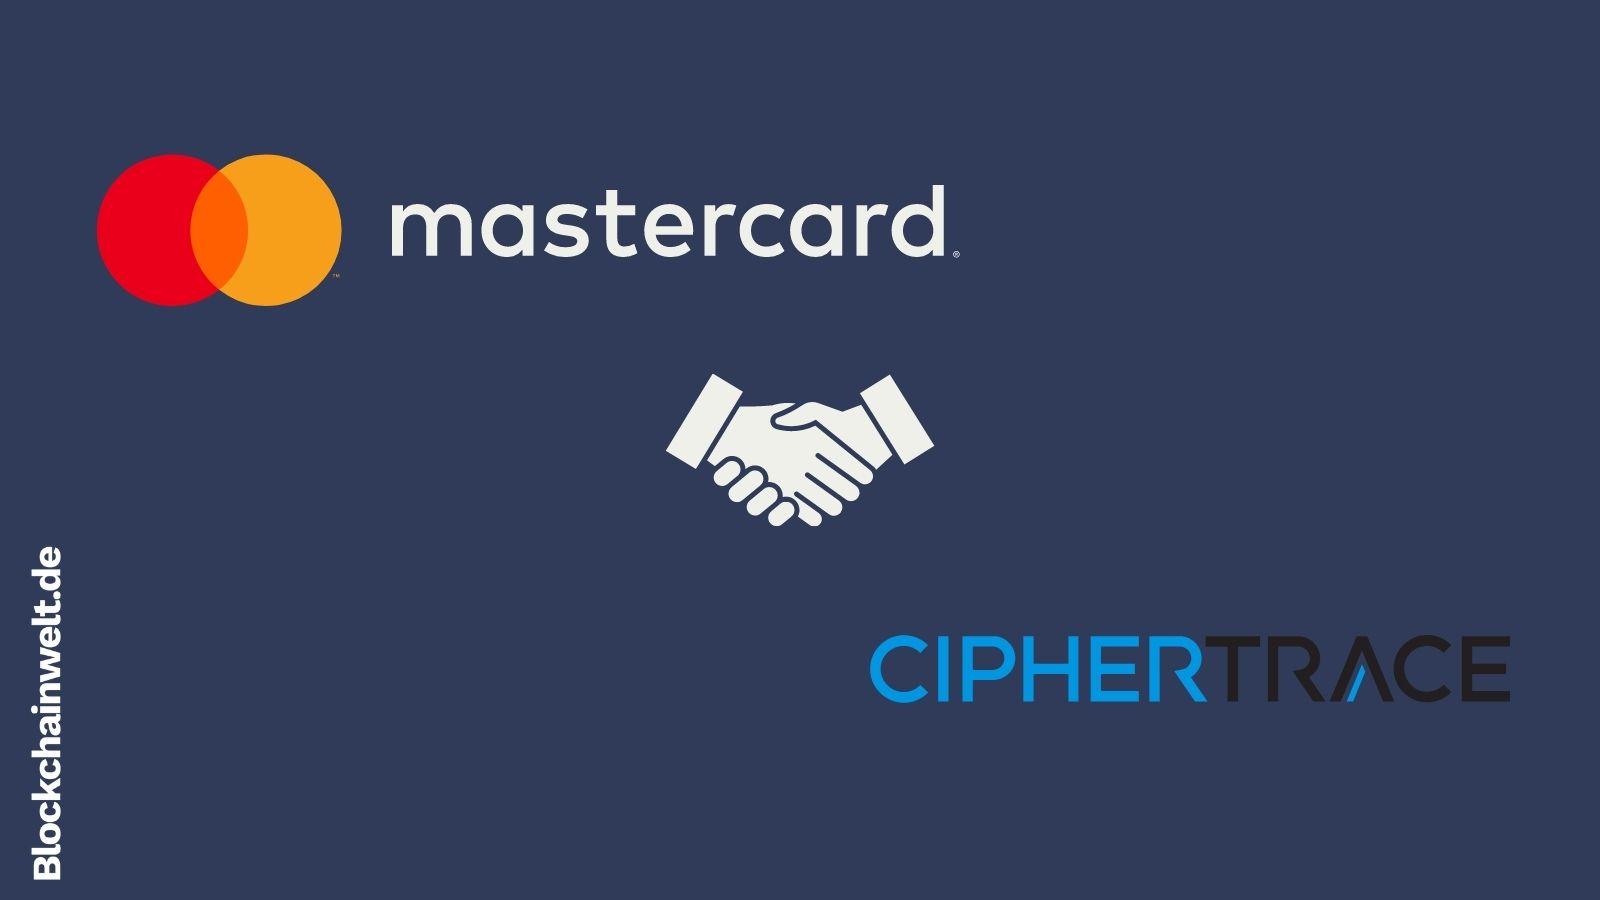 Mastercard CipherTrace